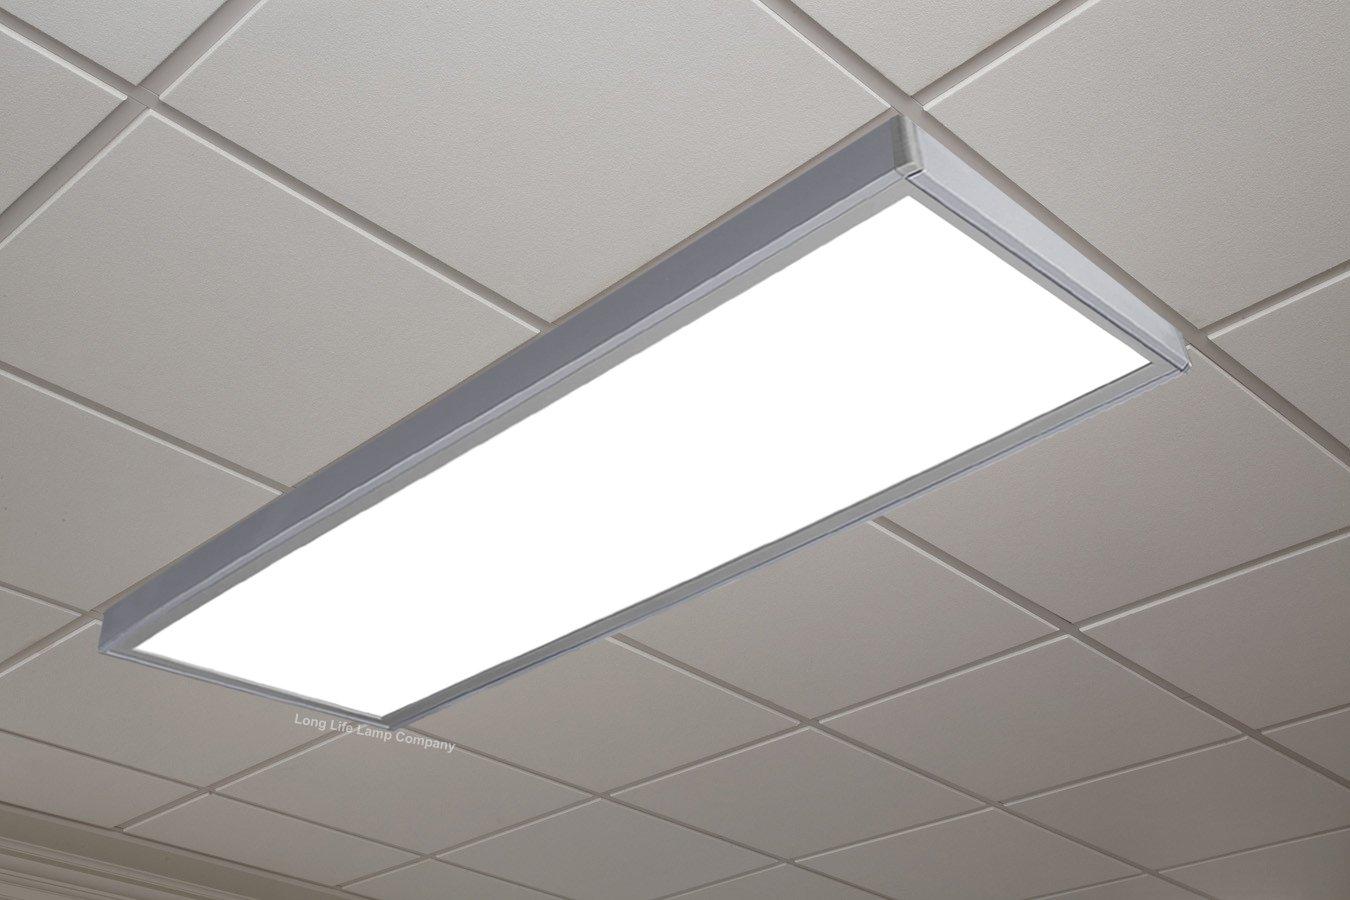 40w Surface Mount LED Panel 1200 x 300 Frame with LED Panel White Body  6500k Super Bright Daylight